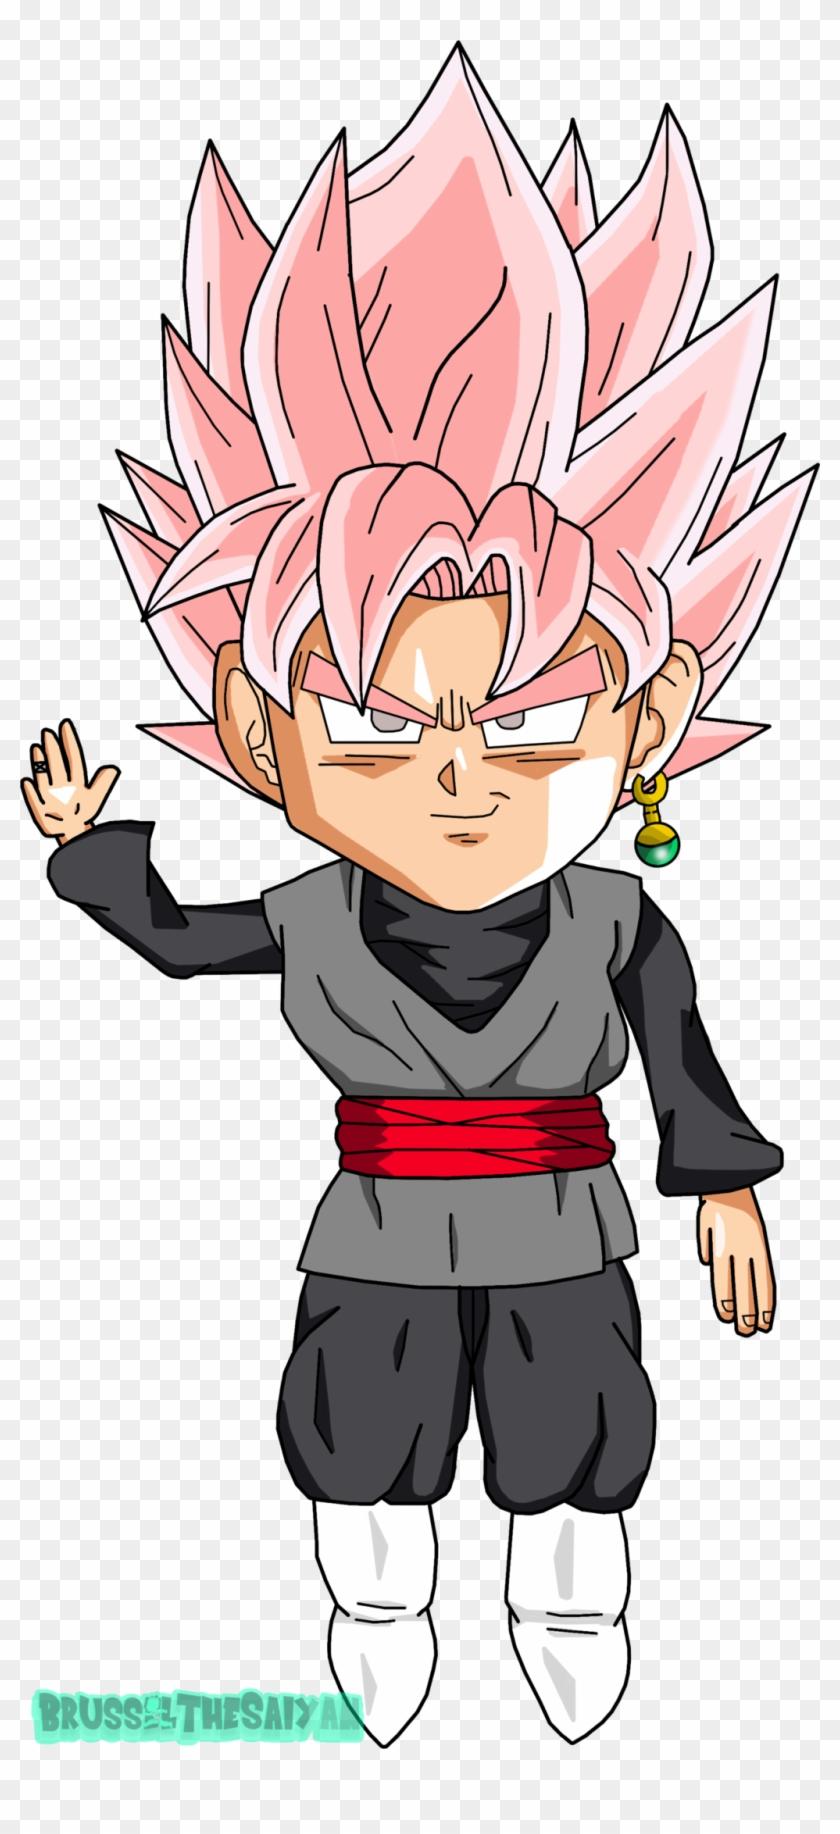 Goku Clipart Late Black Goku Ssj Rose Chibi Hd Png